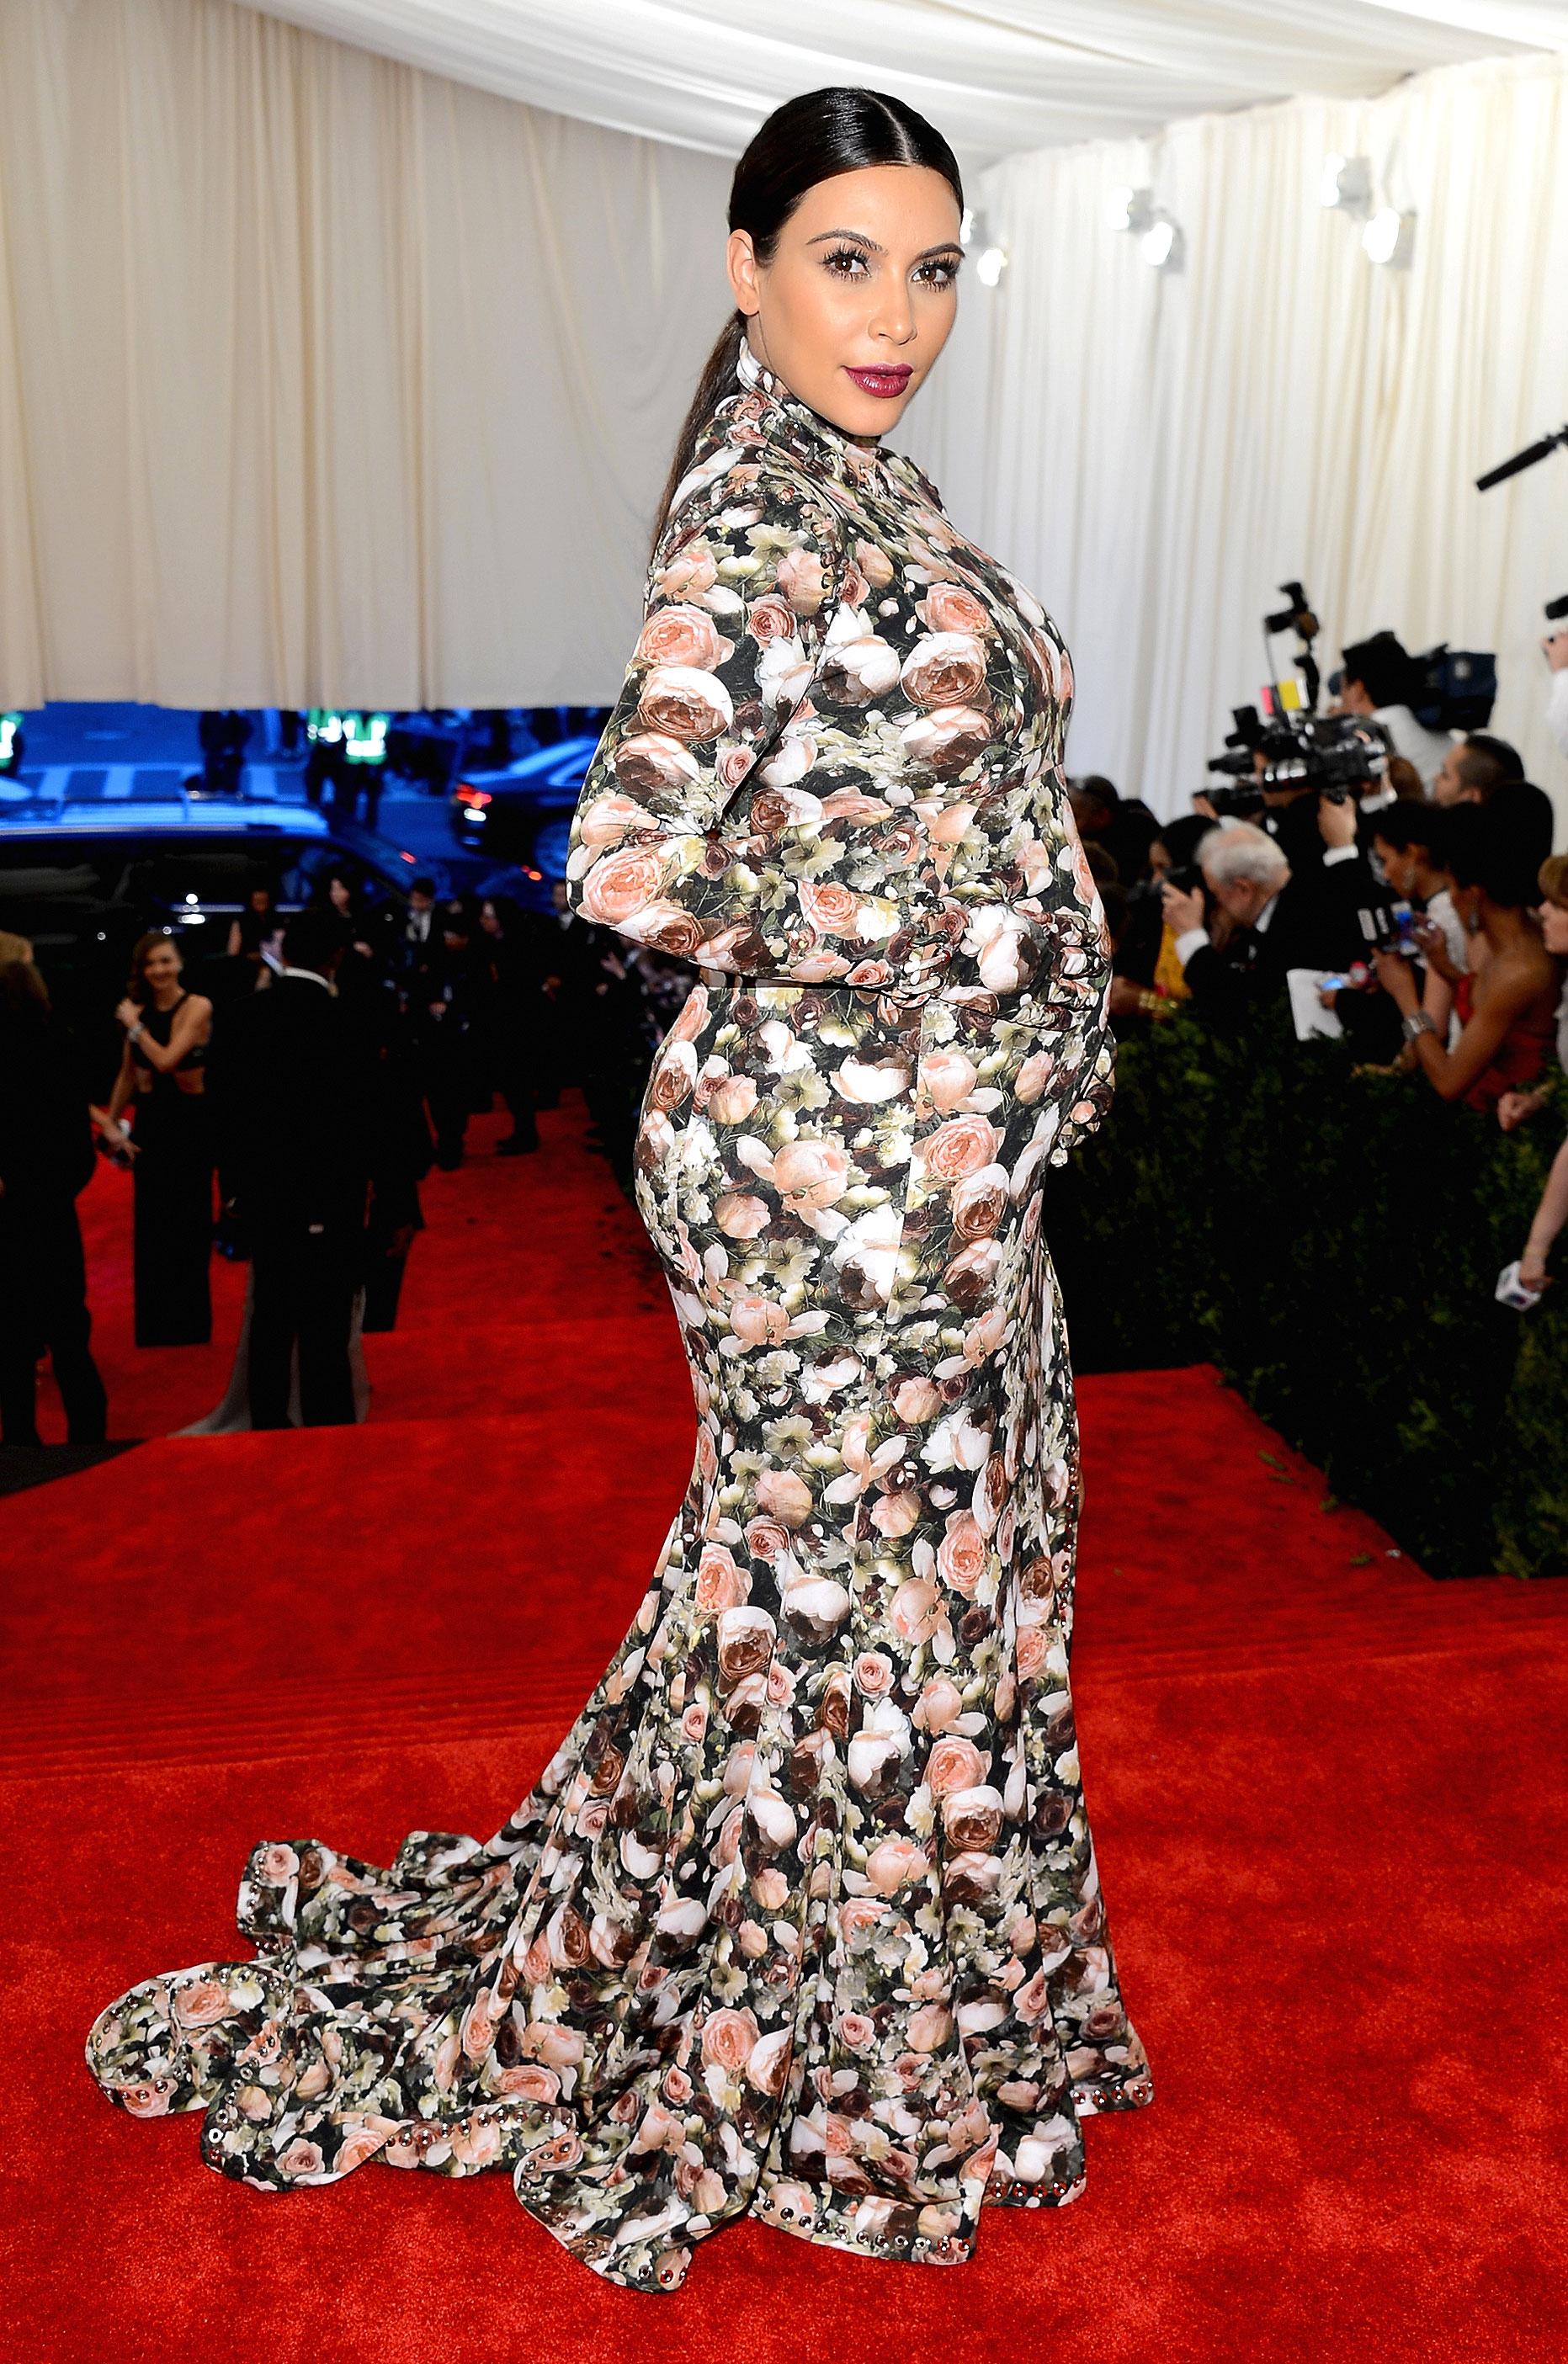 Kim Kardashian - In Givenchy by Riccardo Tisci.